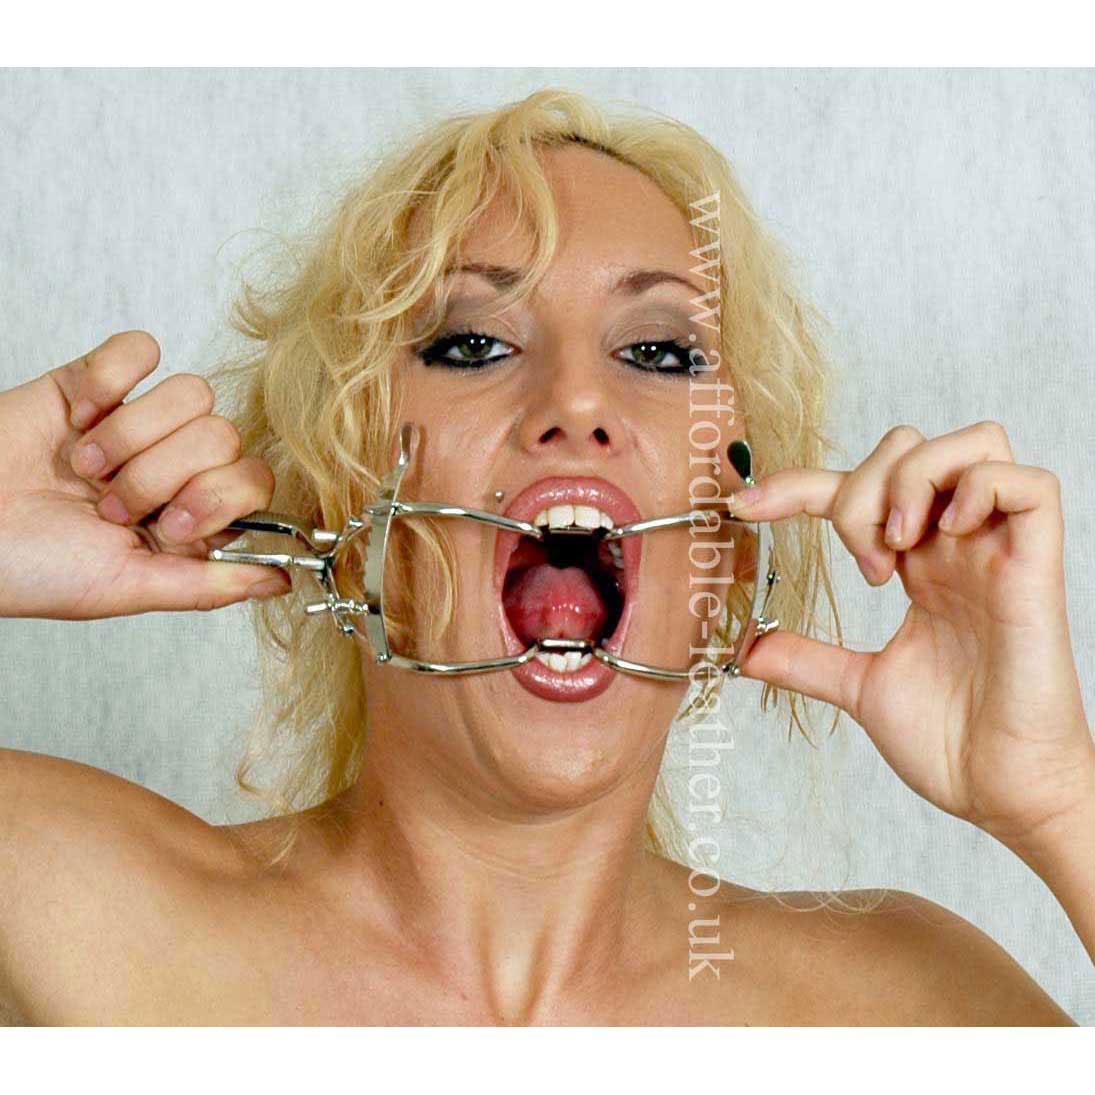 Whitehead Plain Metal Dental Gag